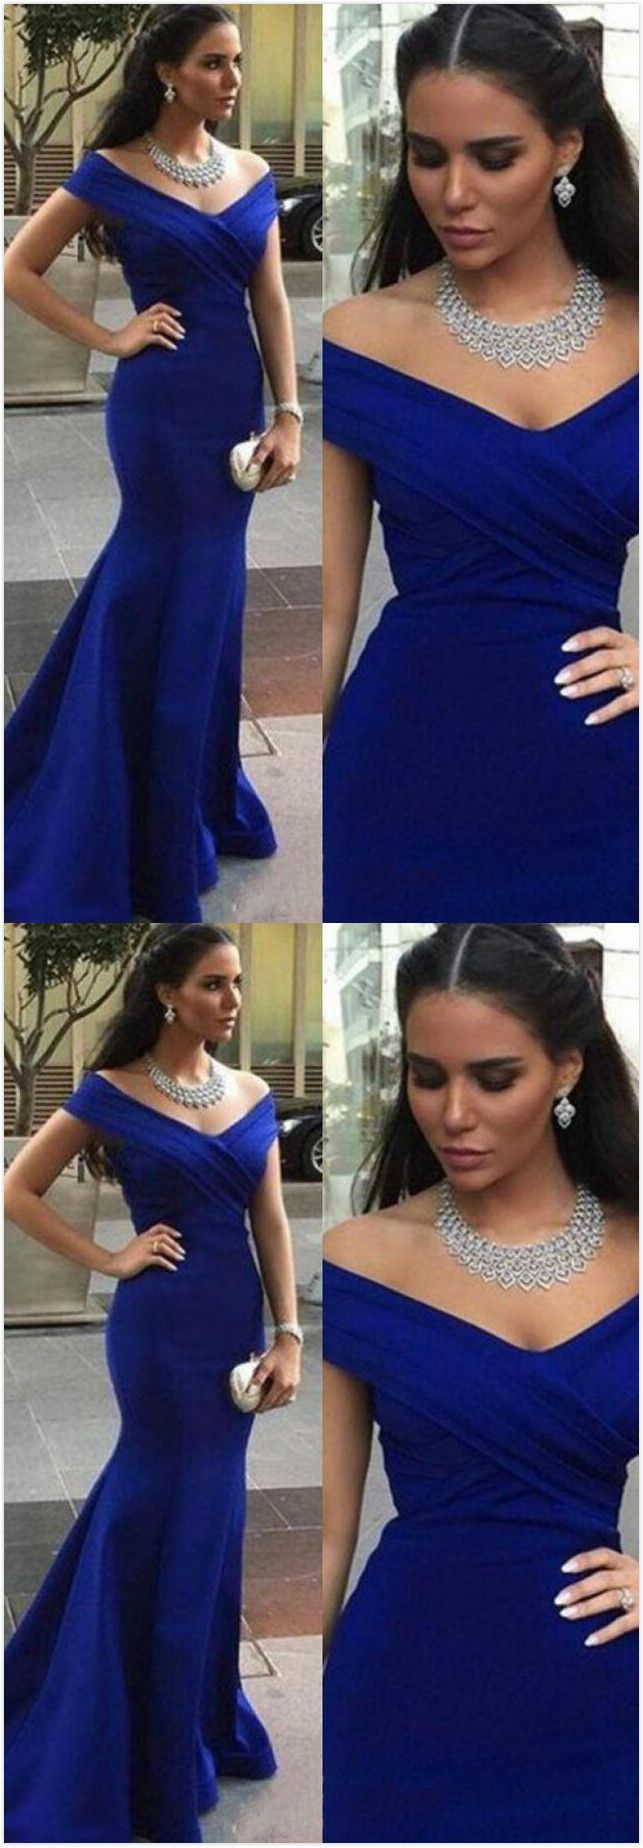 V Neck Prom Dress,Mermaid Prom Dress,Cheap Prom Dress,Sexy Prom Dress 2018 from wisebridal.com